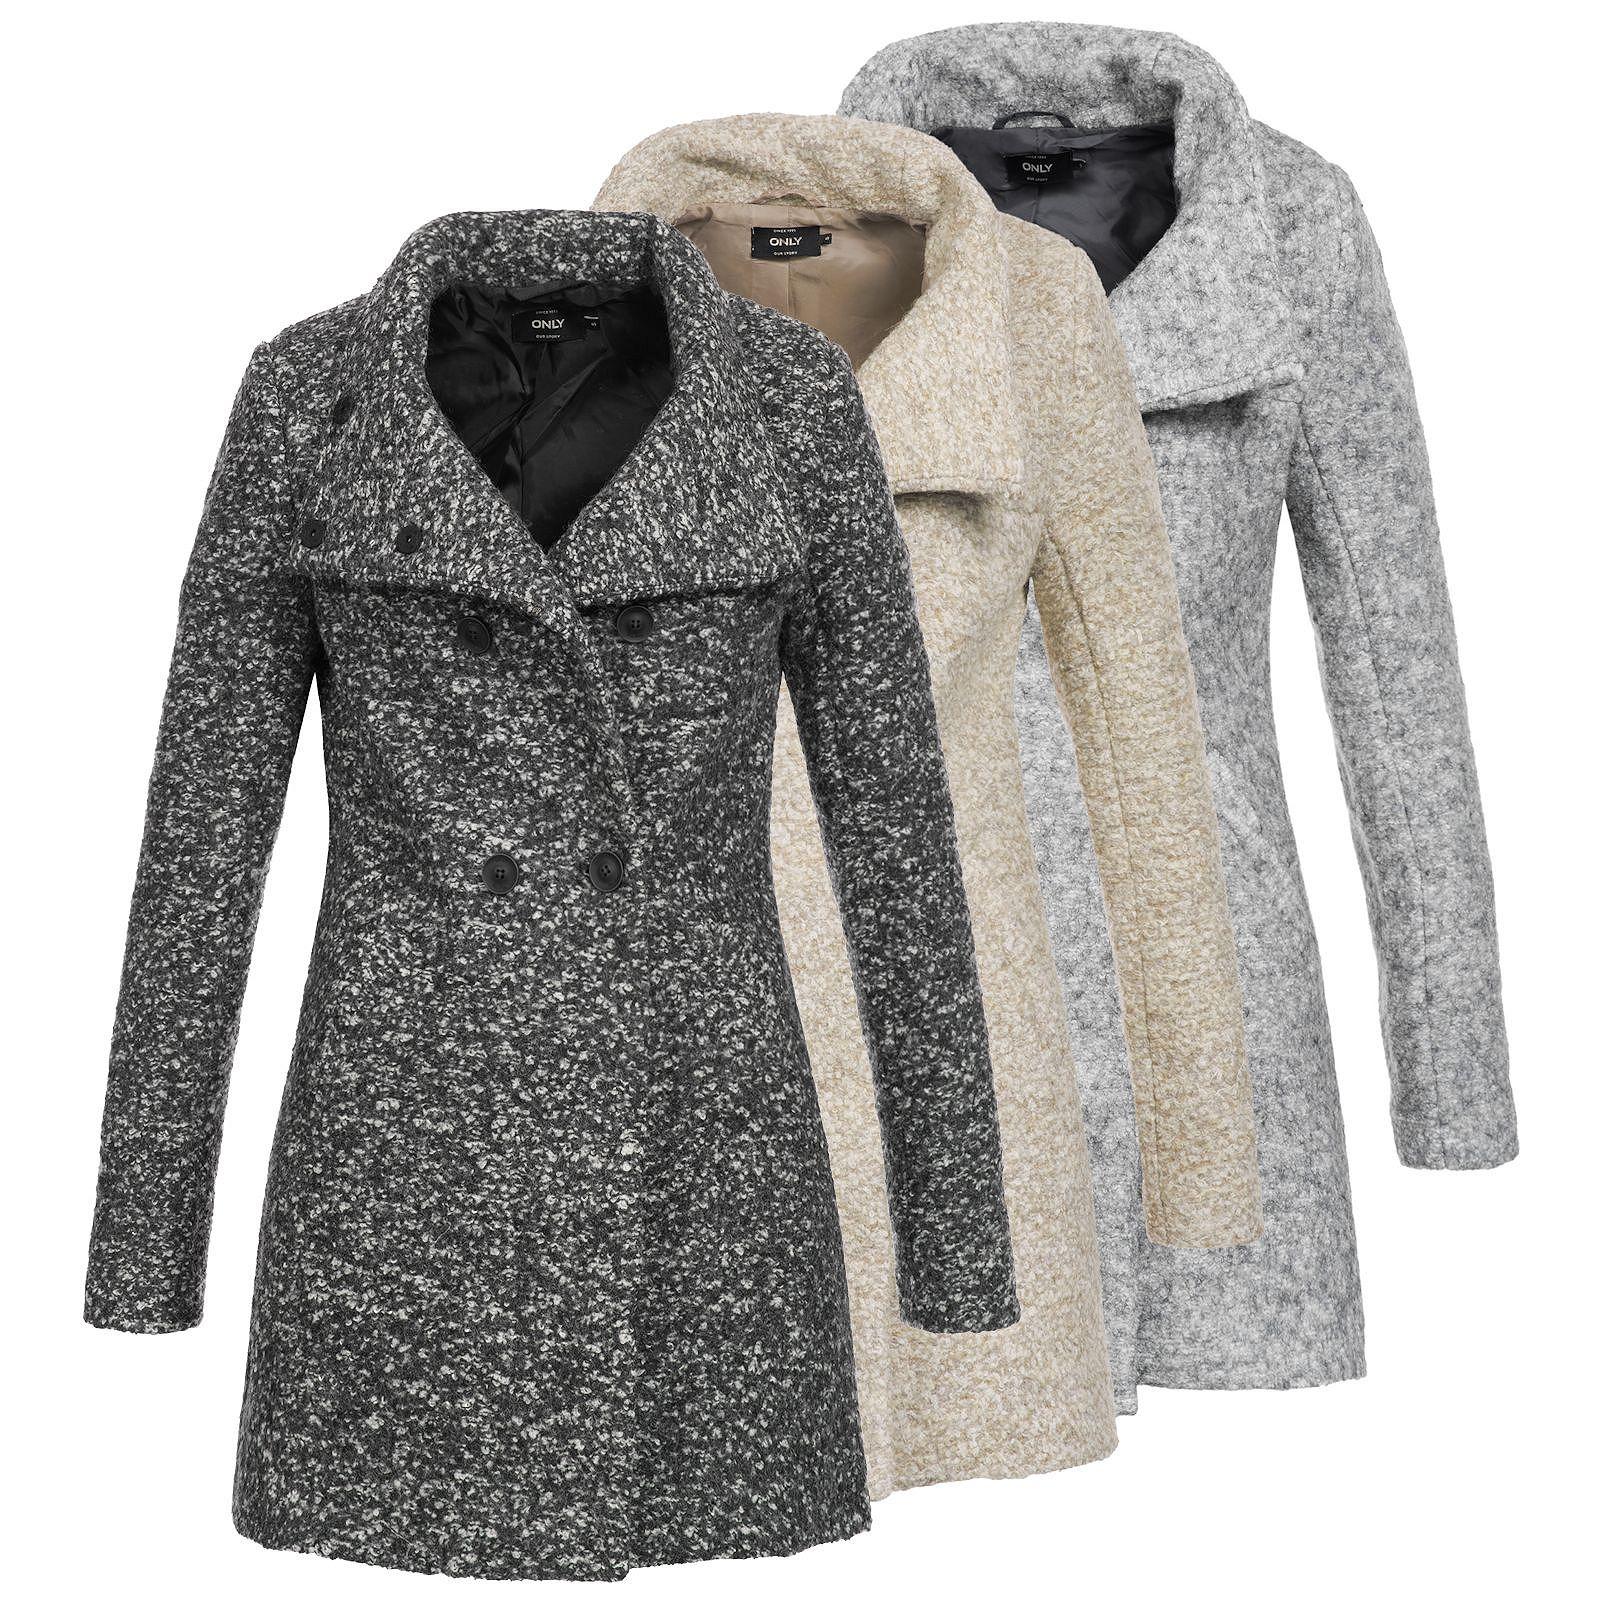 wholesale dealer official site cheapest price Only Damen Wollmantel Sophia Noma